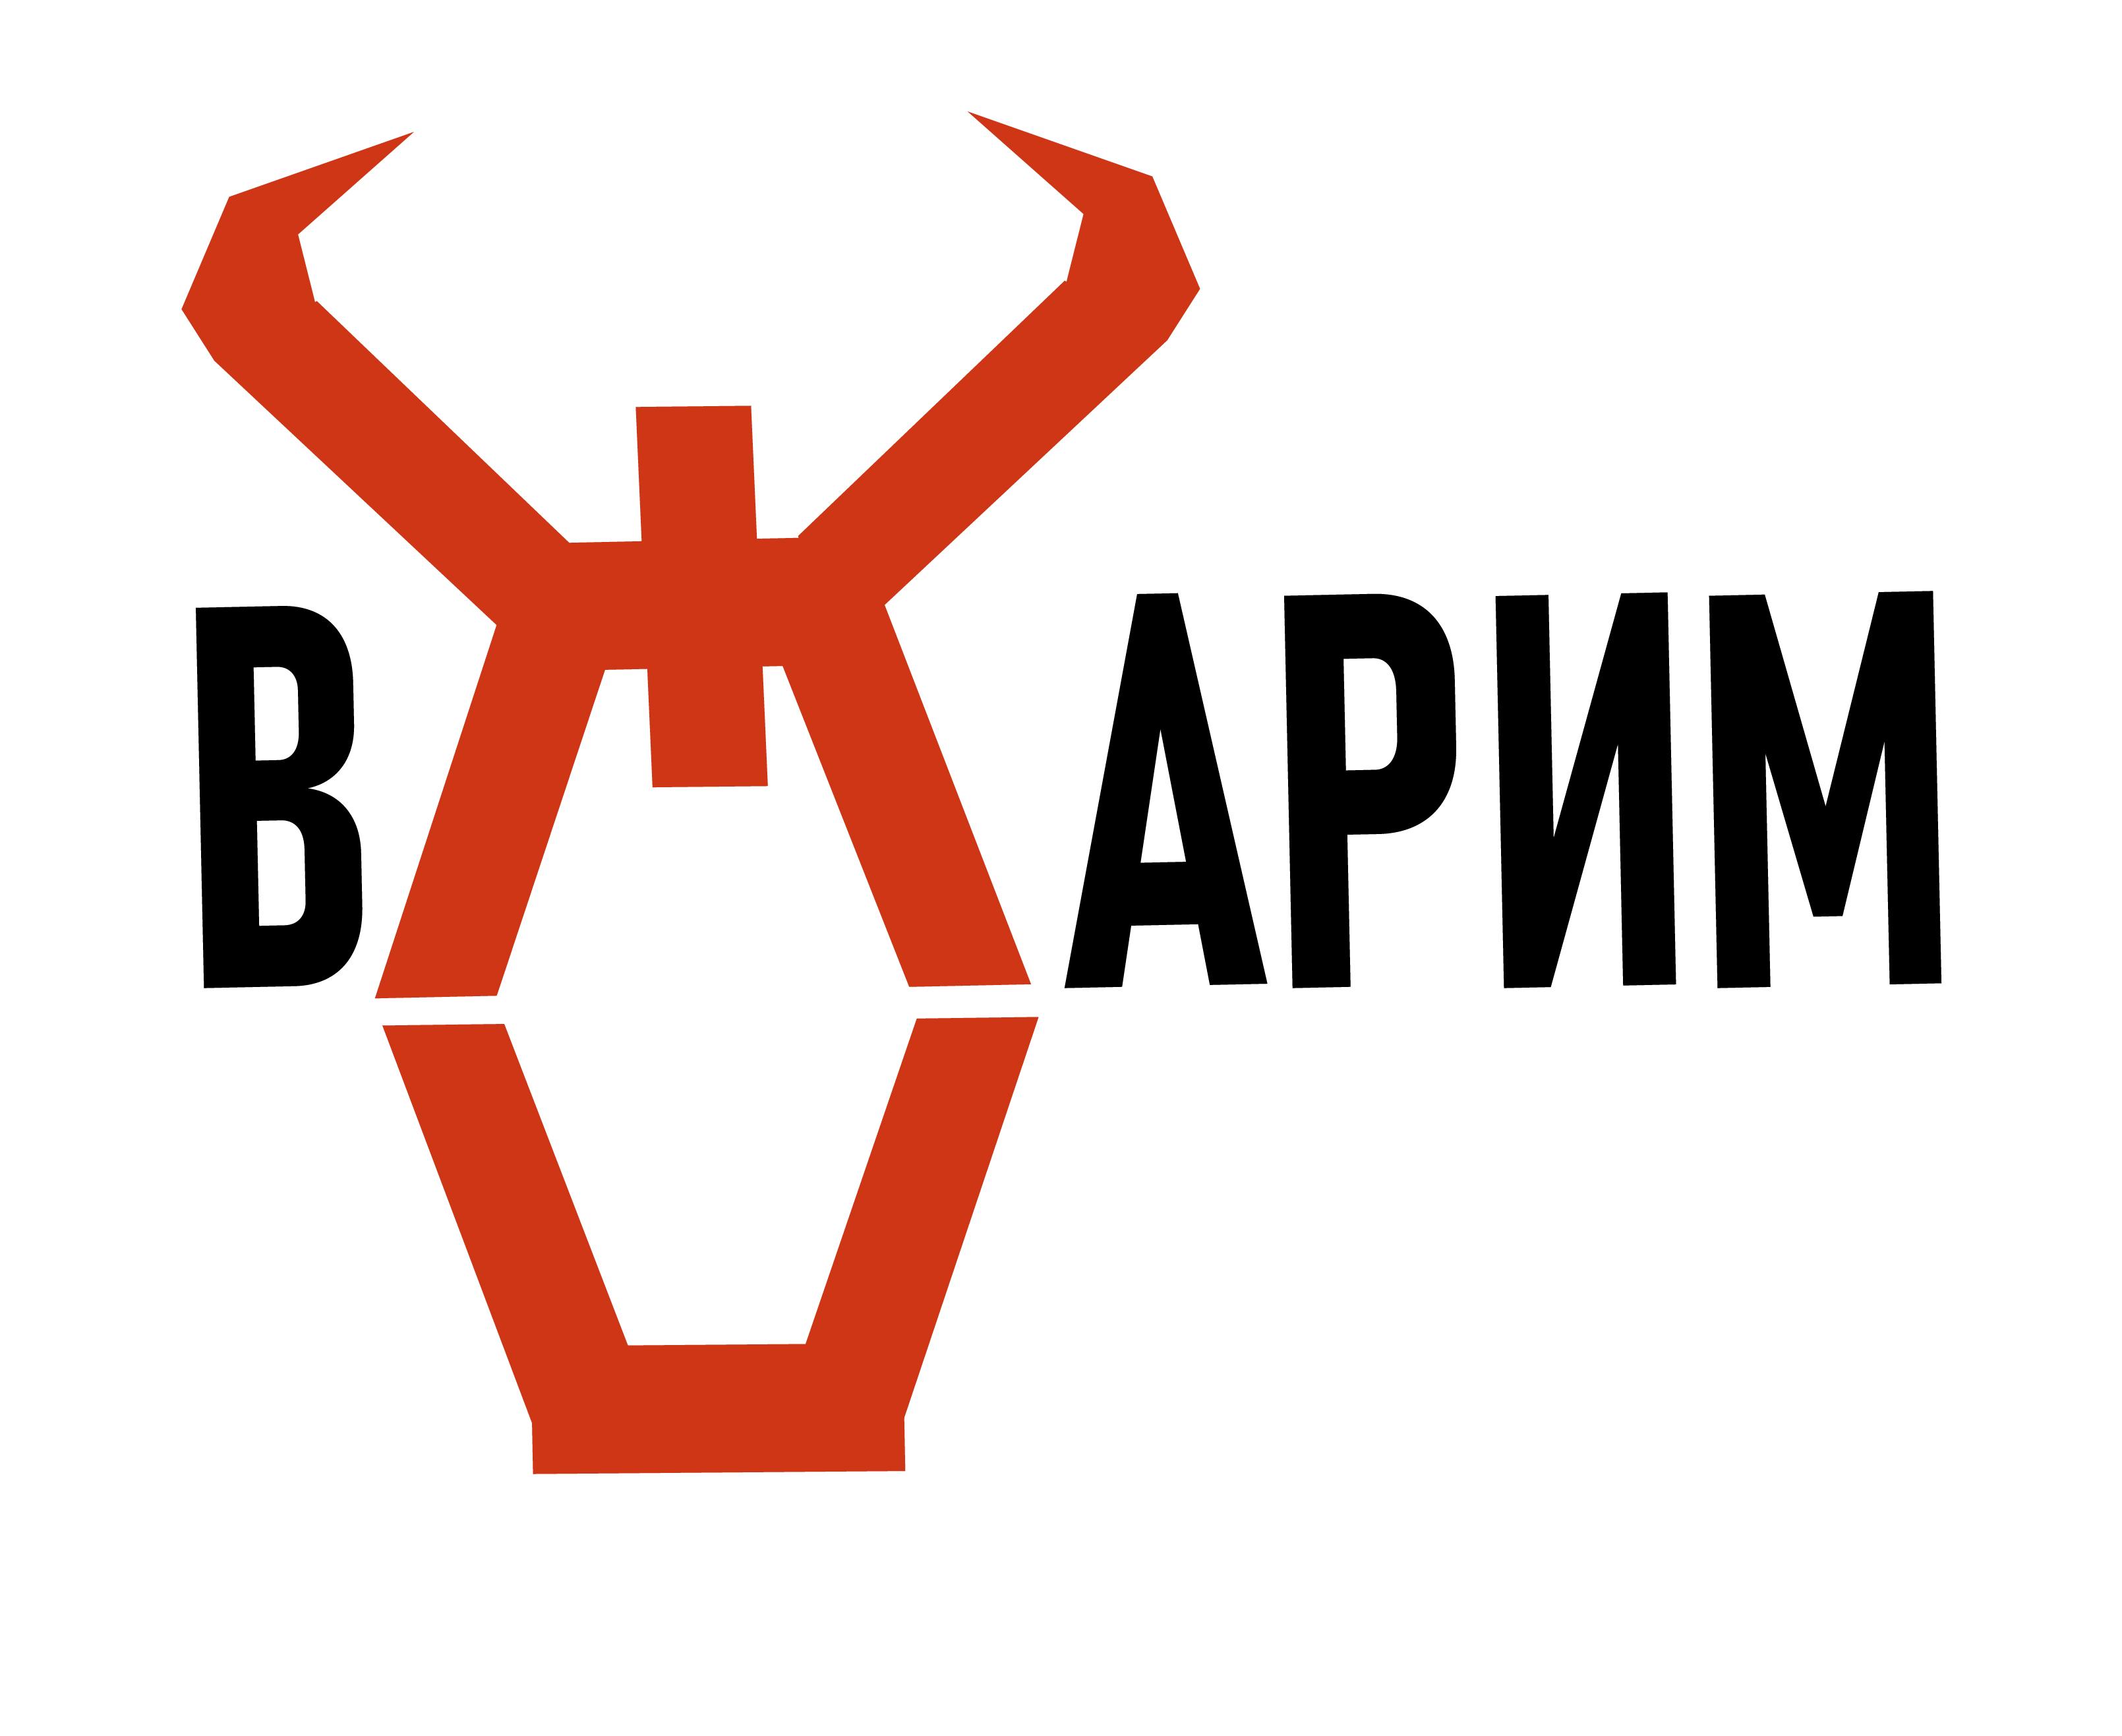 Требуется, разработка логотипа для крафт-кафе «ВЖАРИМ». фото f_194600843a2d7306.jpg